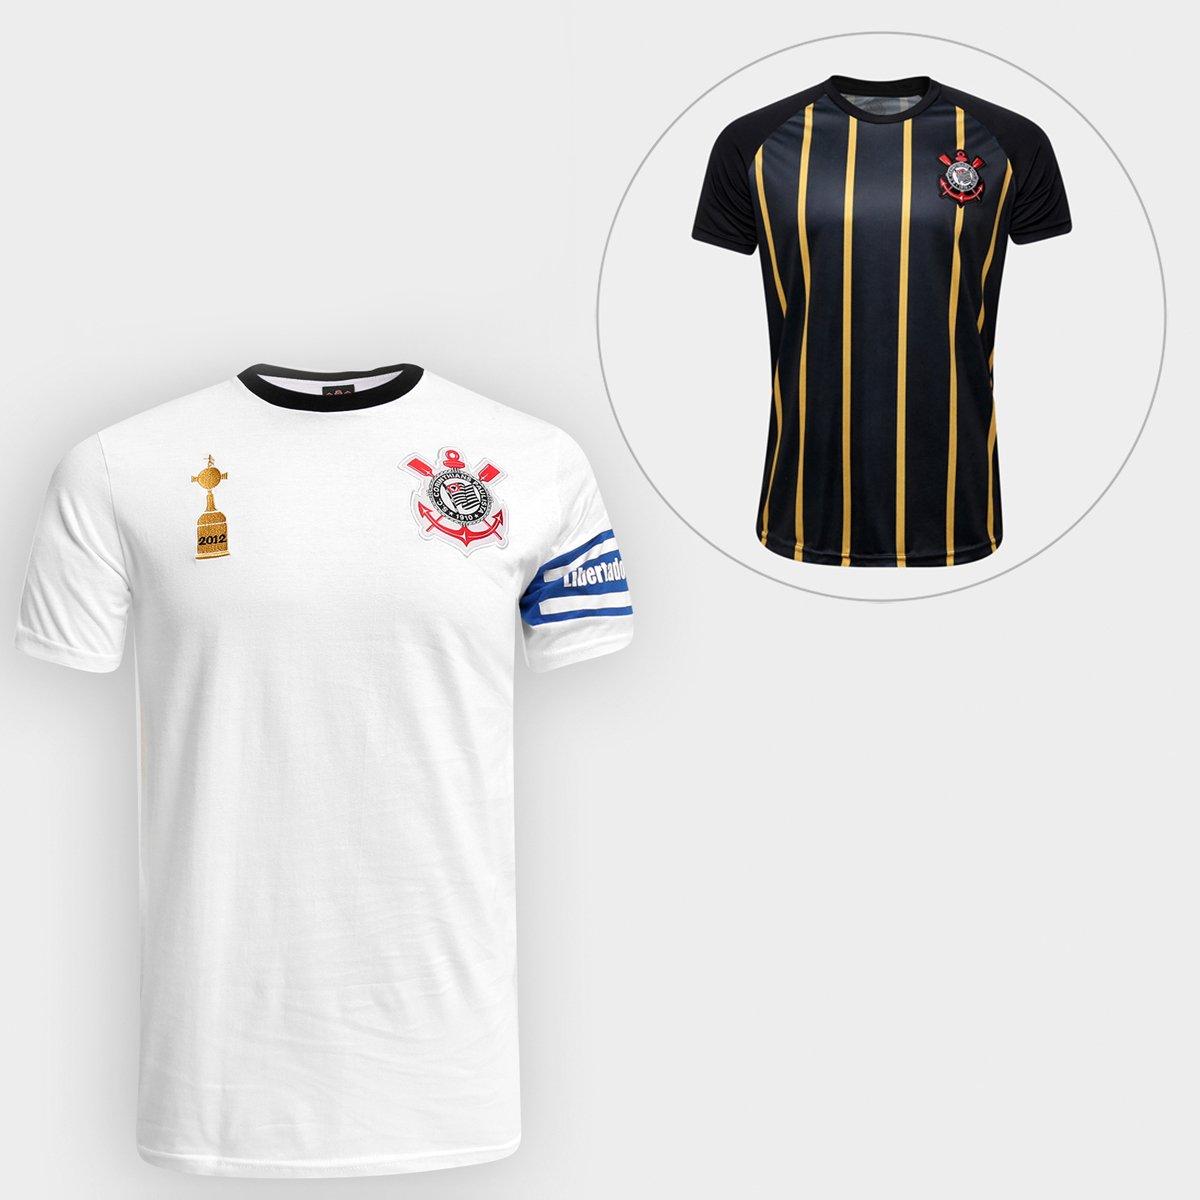 Kit Camiseta Corinthians Capitães Libertadores 2012 n° 2 + Camisa  Corinthians Gold Edição Limitada - 34f98b5bbc546